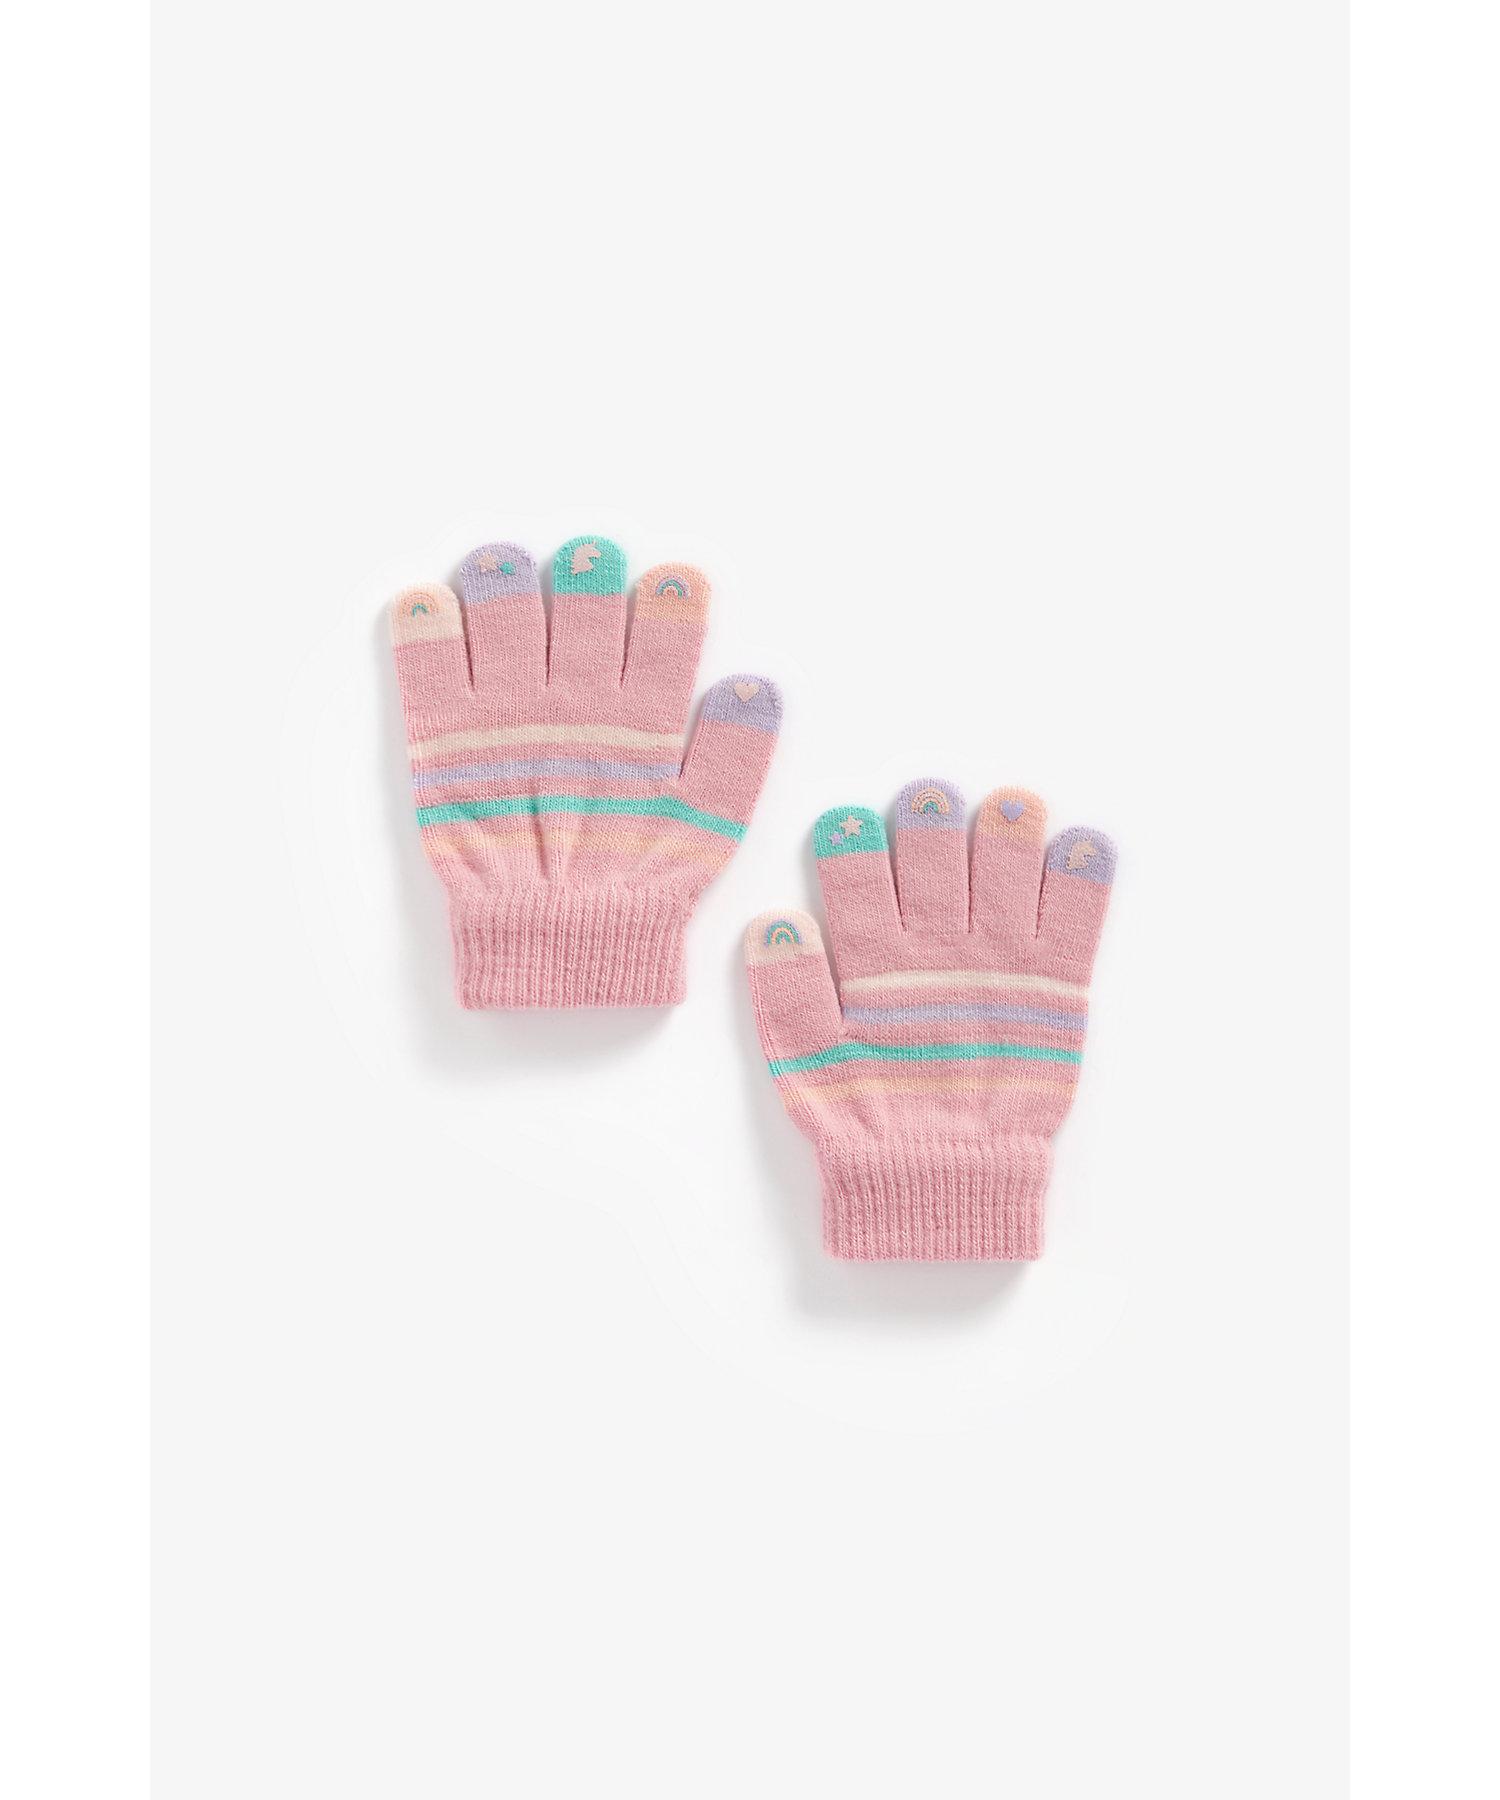 Mothercare | Unisex Full Sleeves Pyjama Set Animal Print - Pack Of 2 - Cream